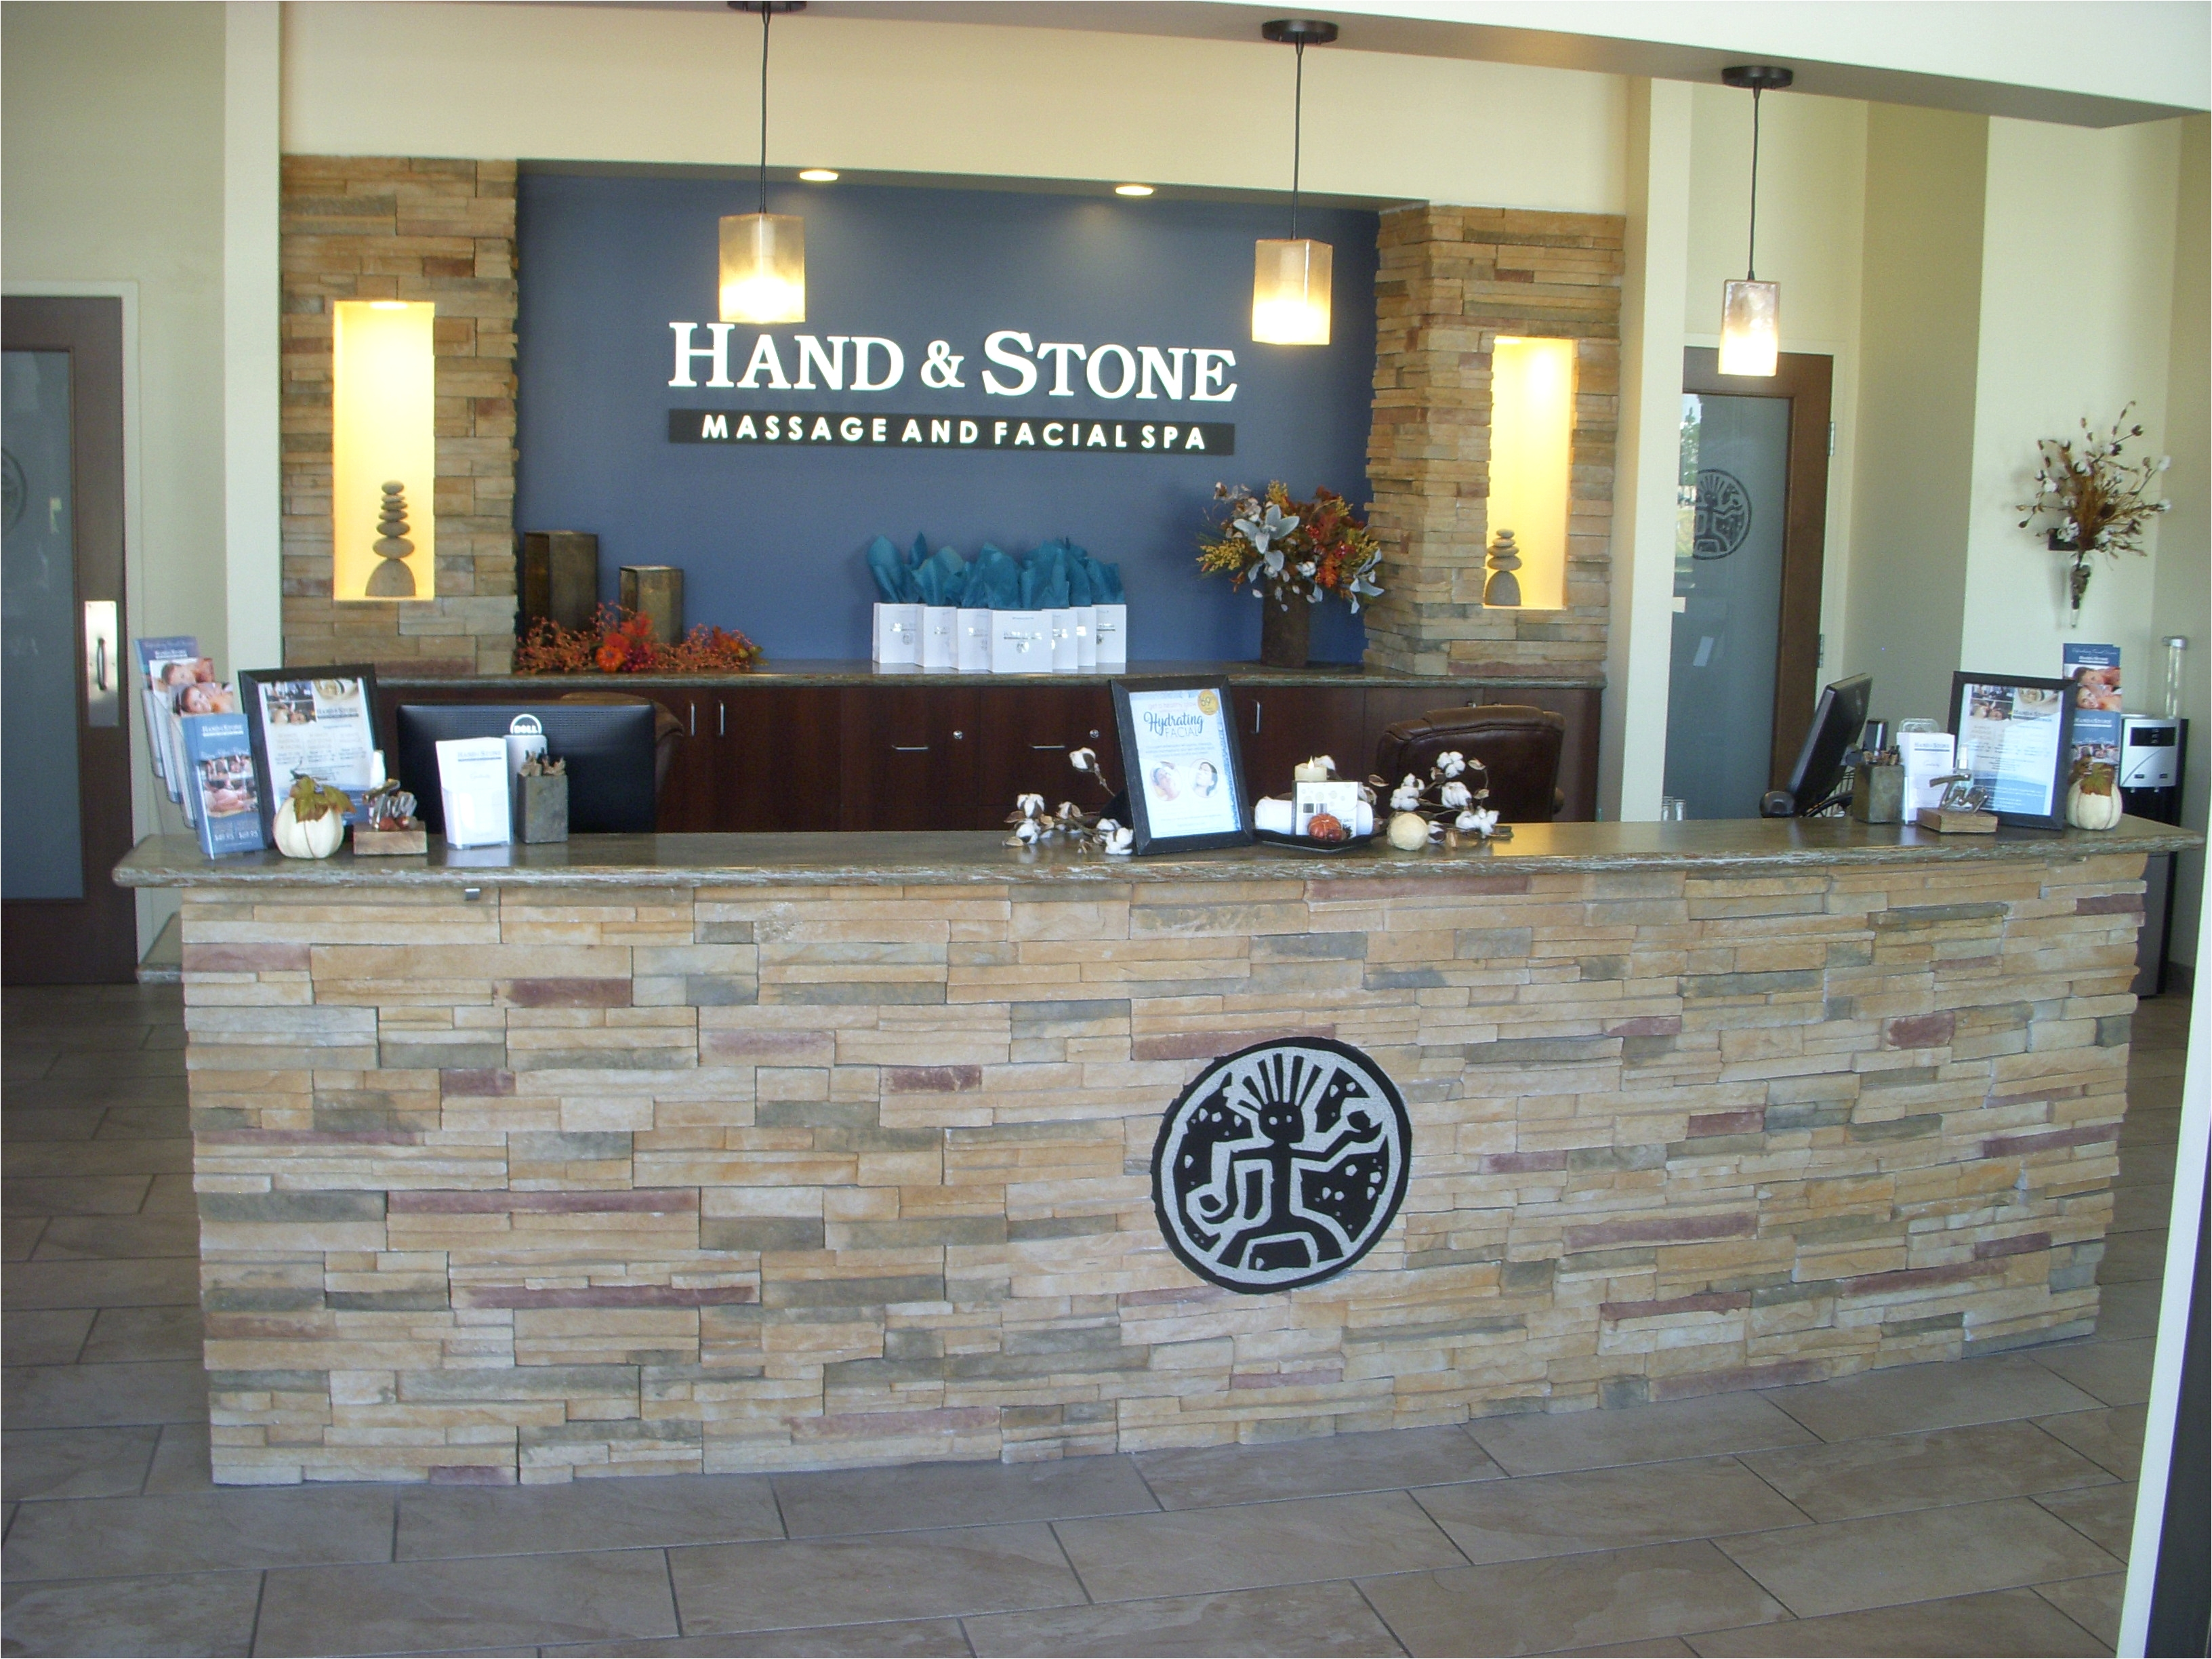 5a314de from tile stores dublin ca image source handandstonespas com